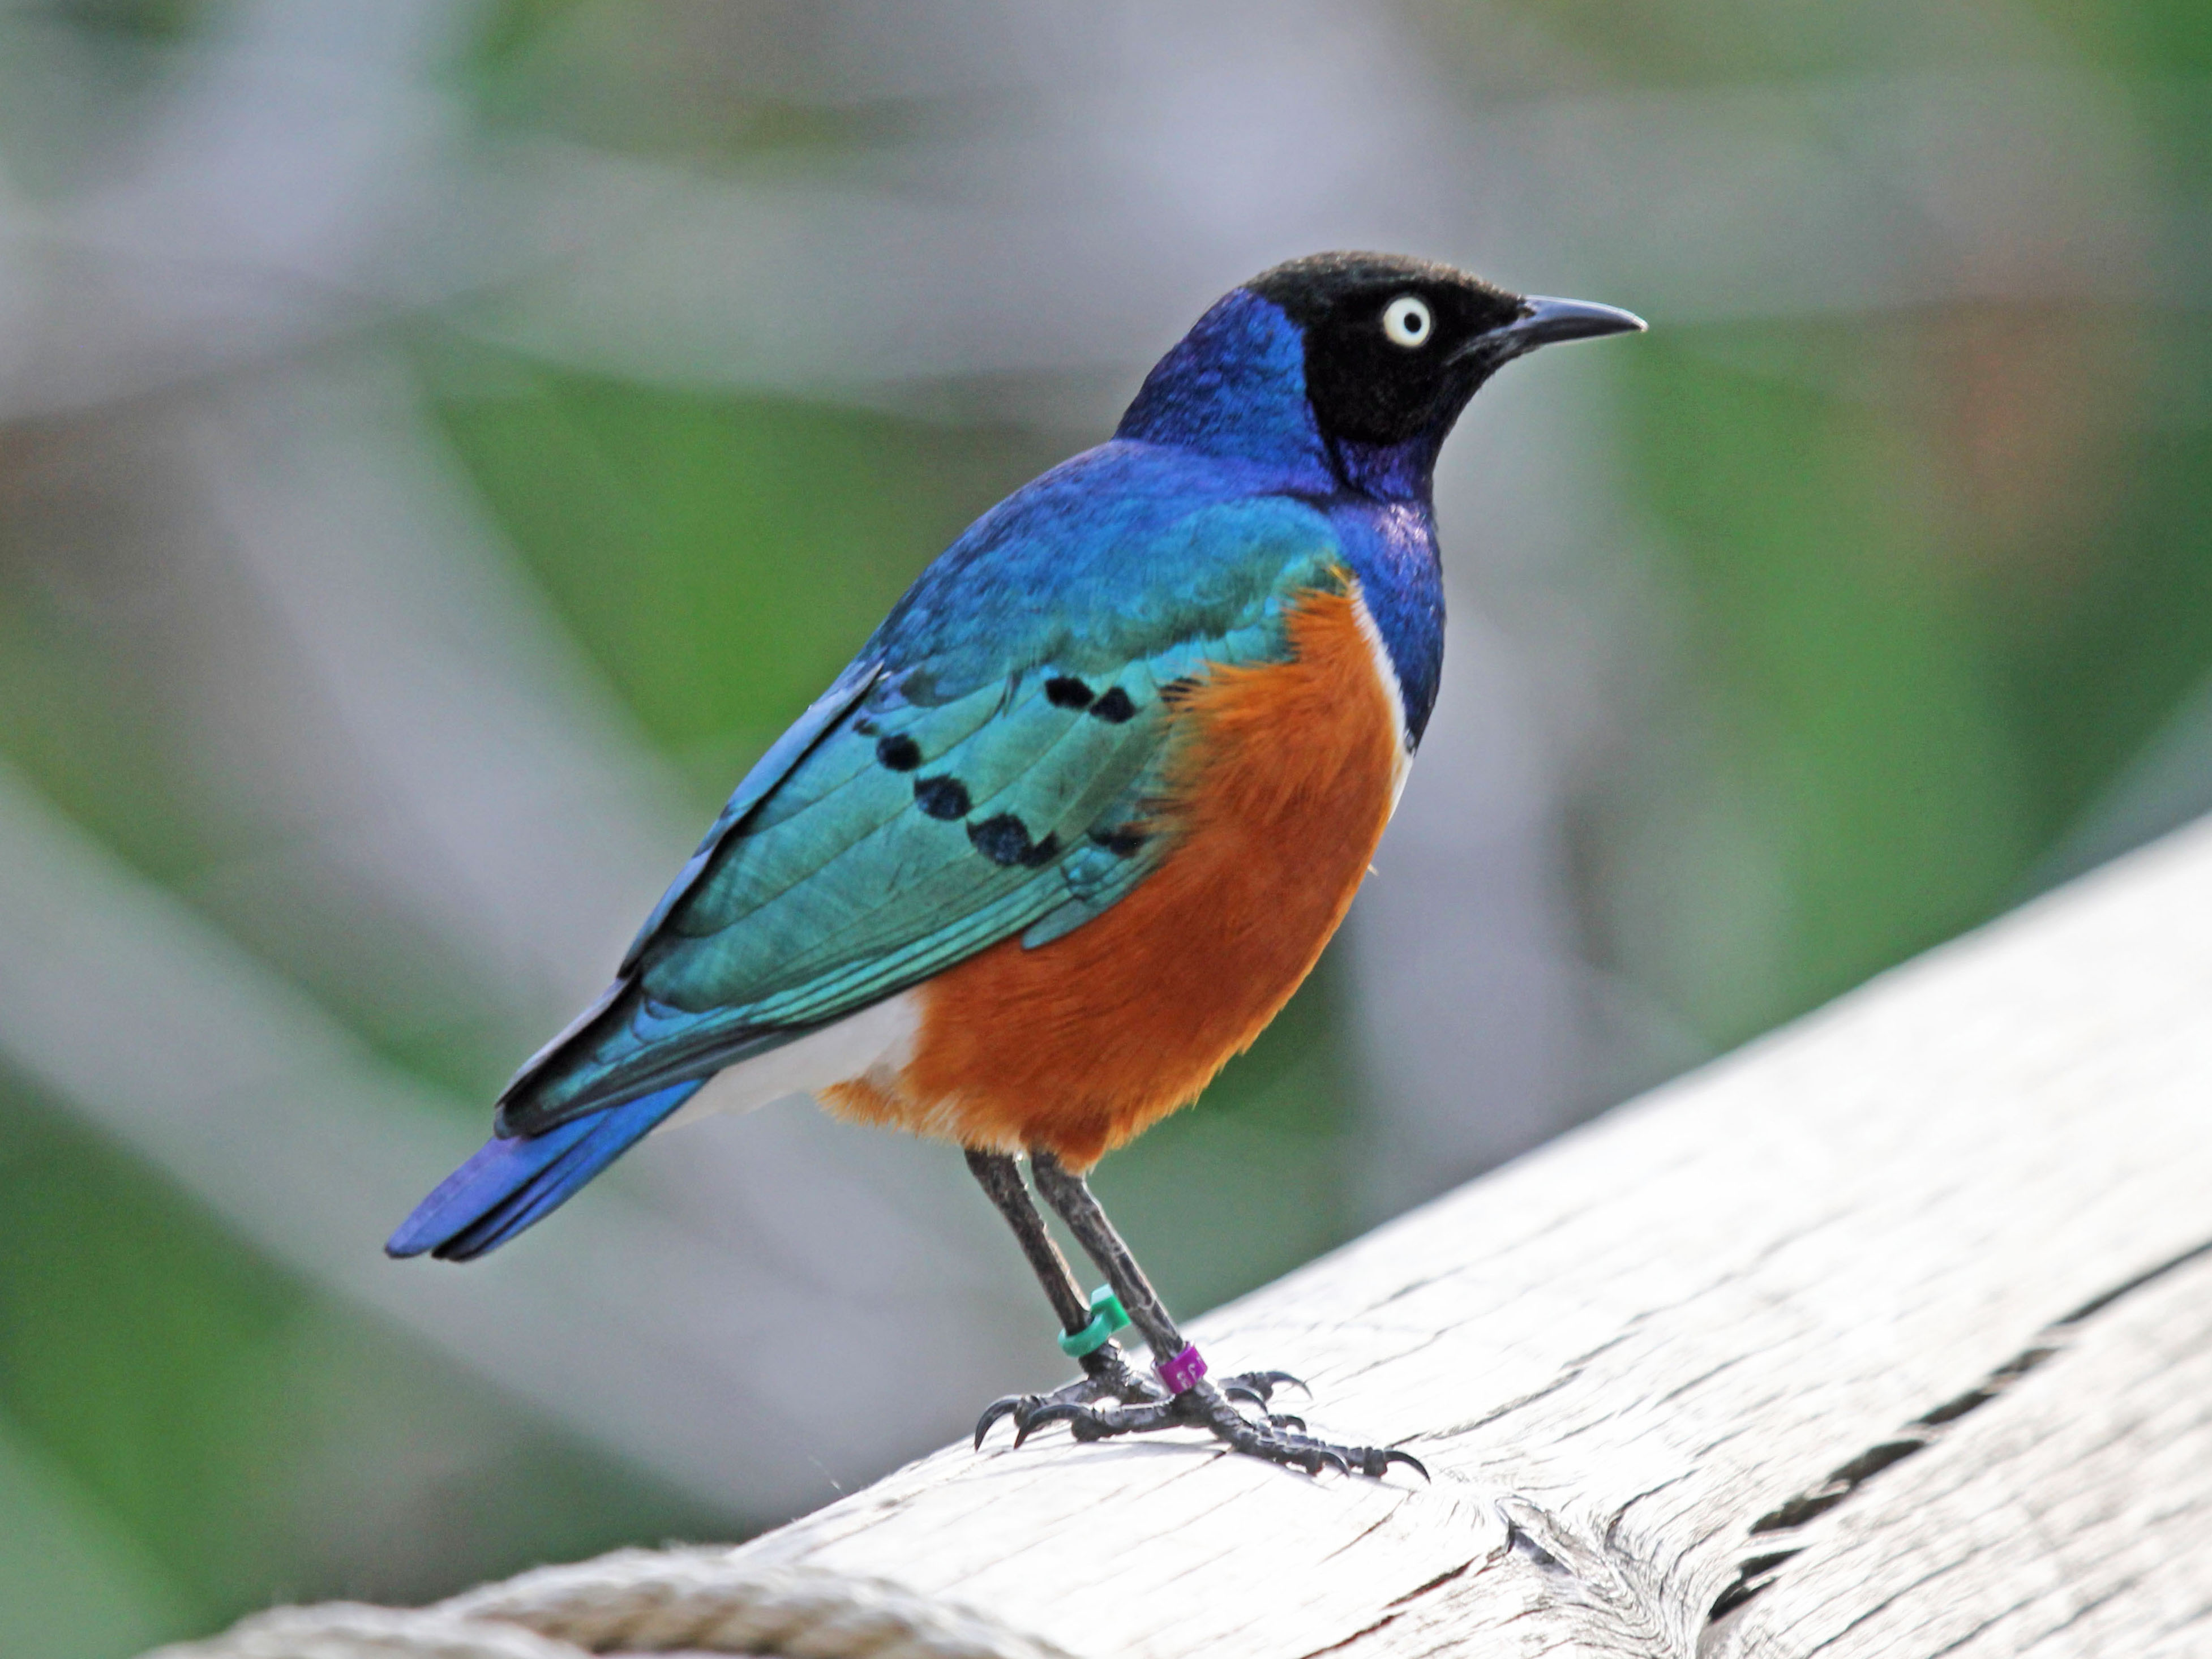 Superb starling : Kicauannya ngeroll seperti jalak suren